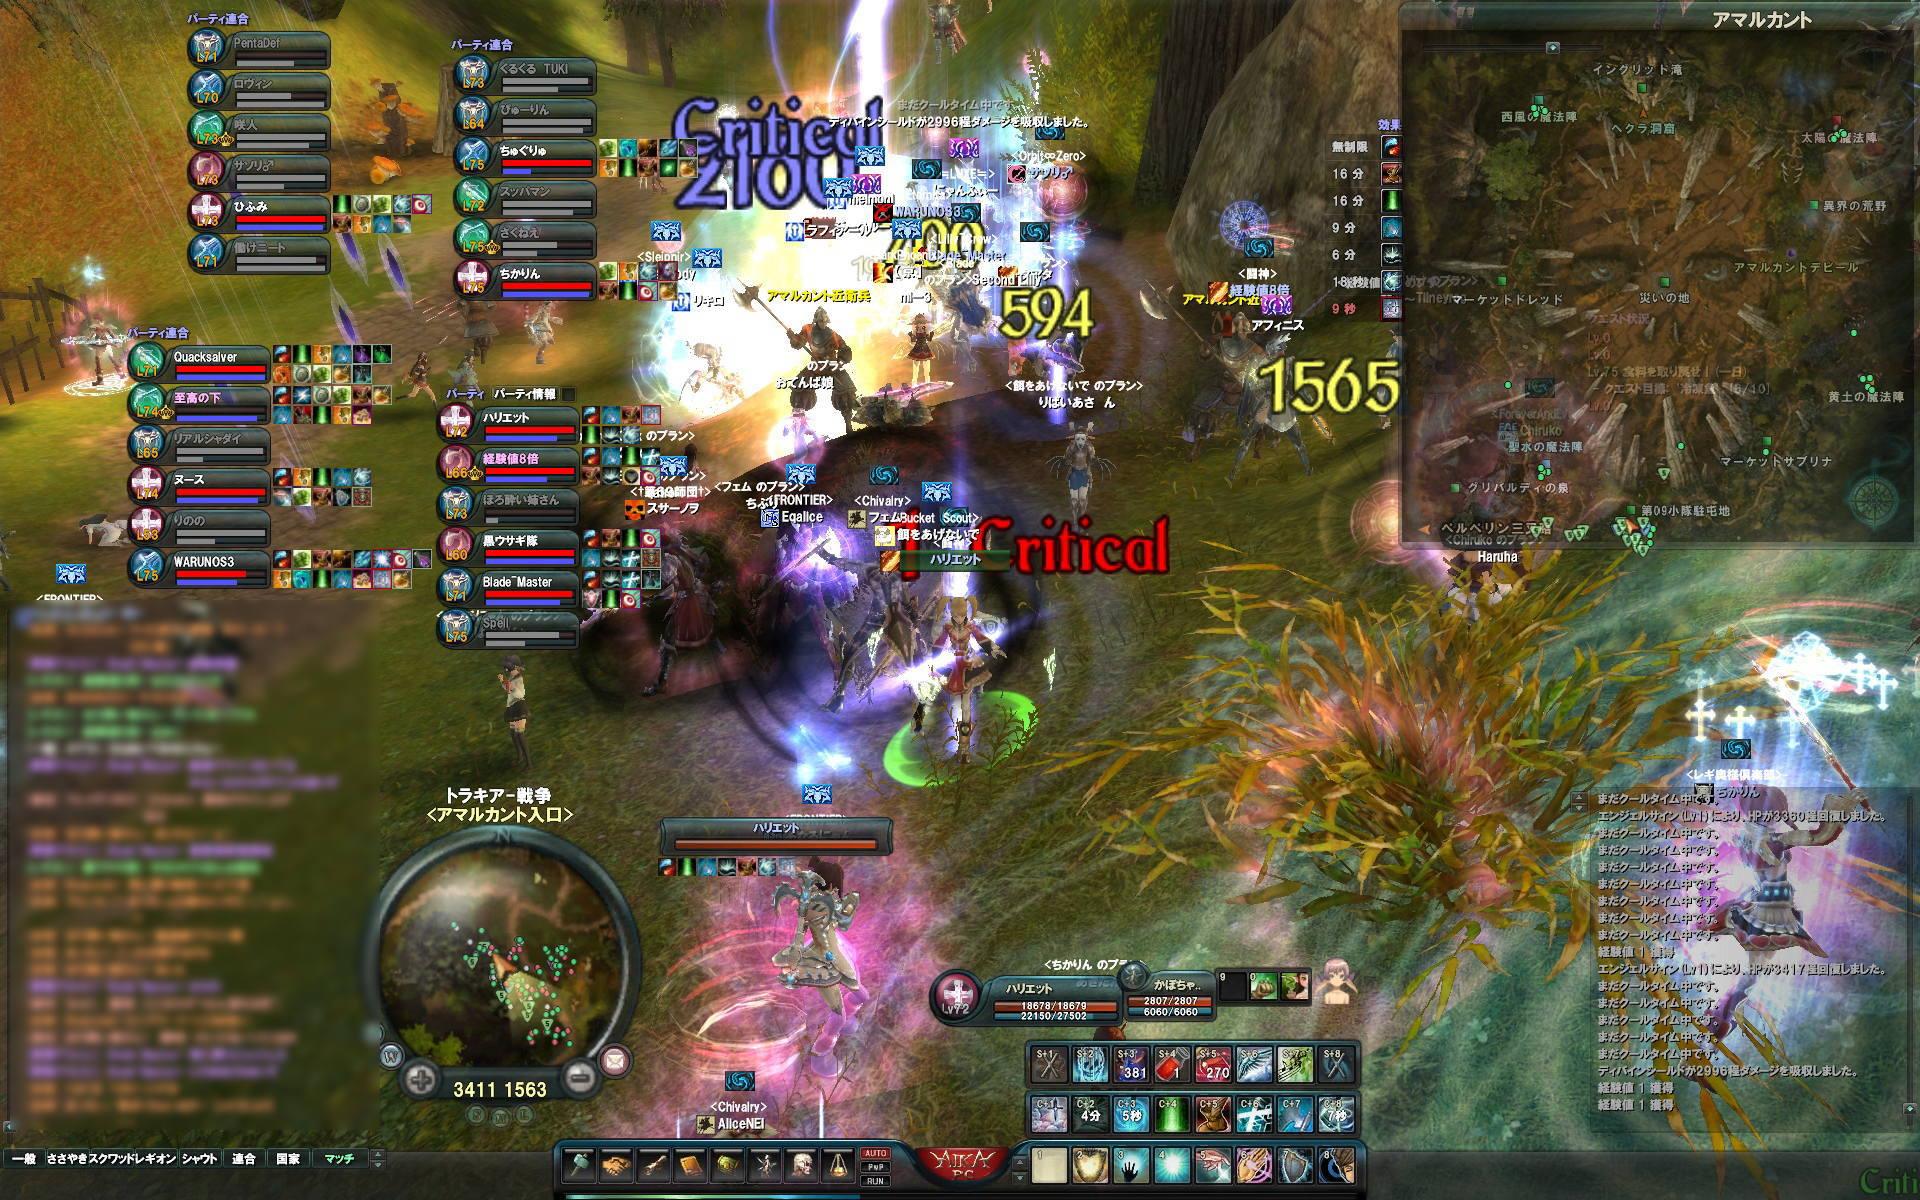 pcss20110322_010.jpg